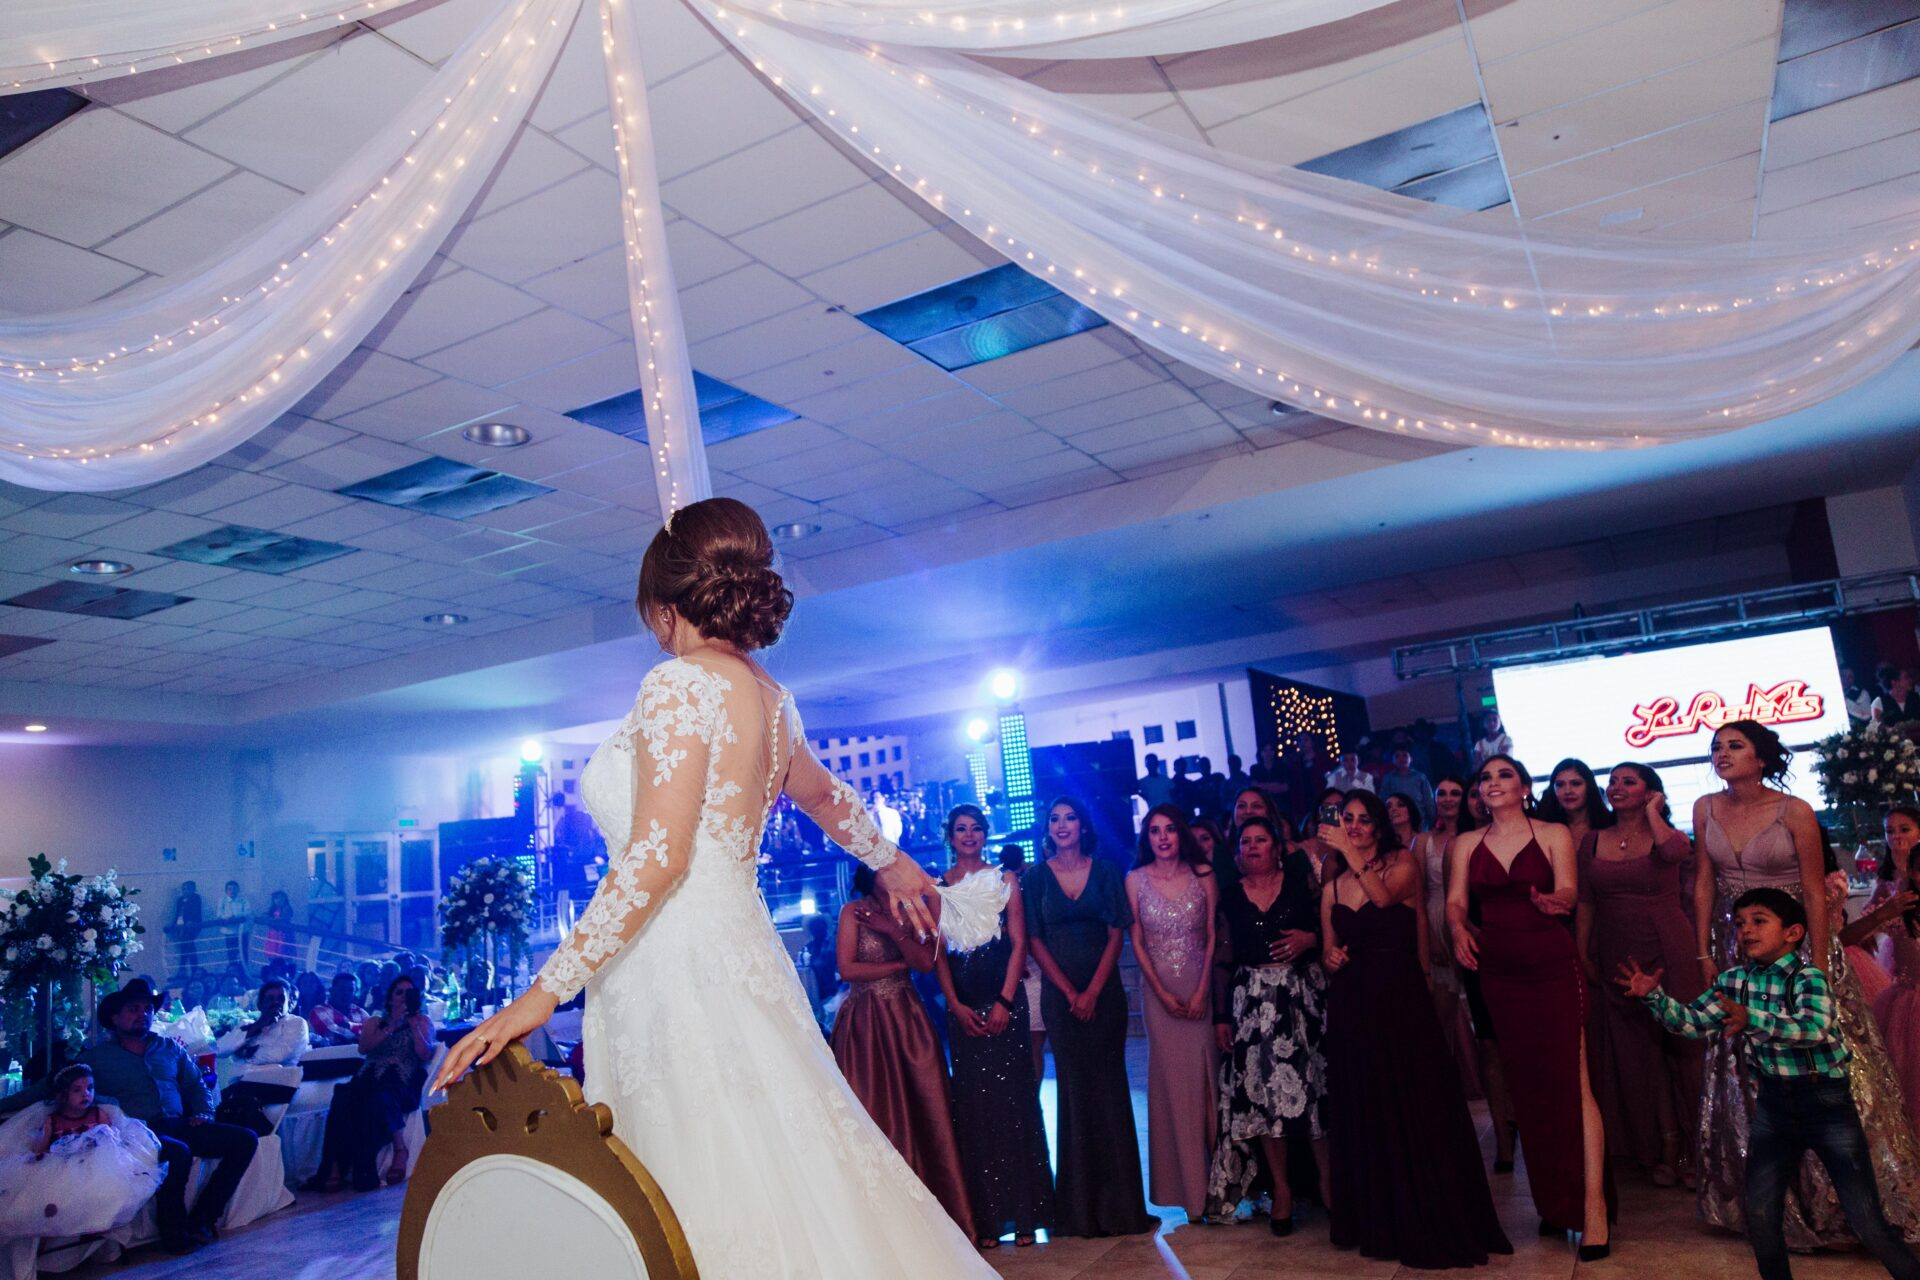 javier_noriega_fotografo_bodas_zacatecas_fresnillo_chihuahua_wedding_photographer21